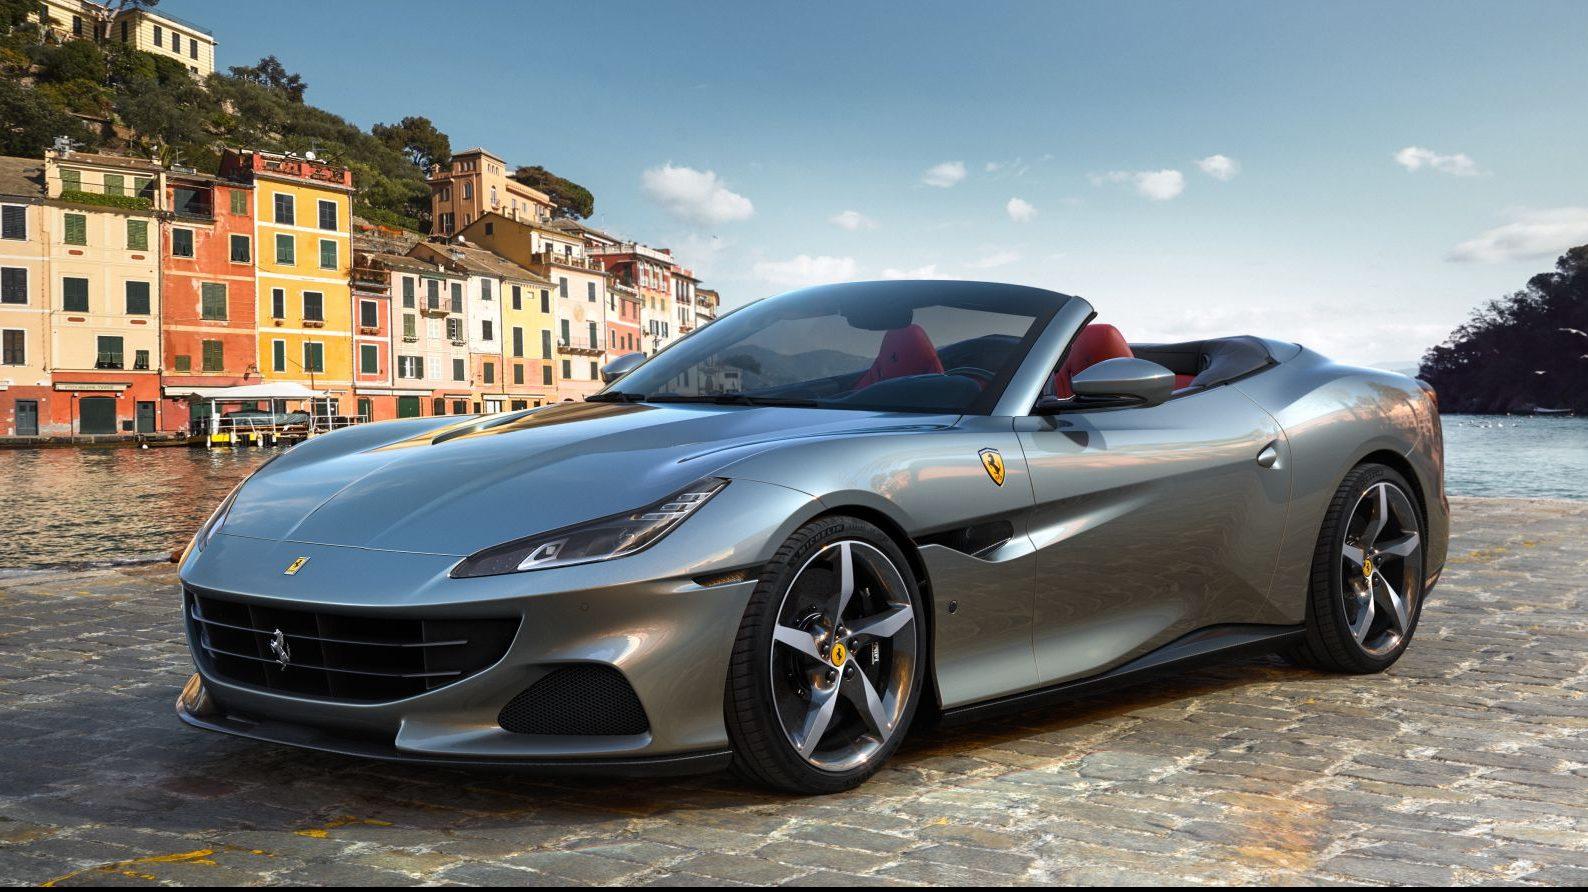 Nova Ferrari Portofino M tem mesmo motor da Roma e câmbio de oito marchas